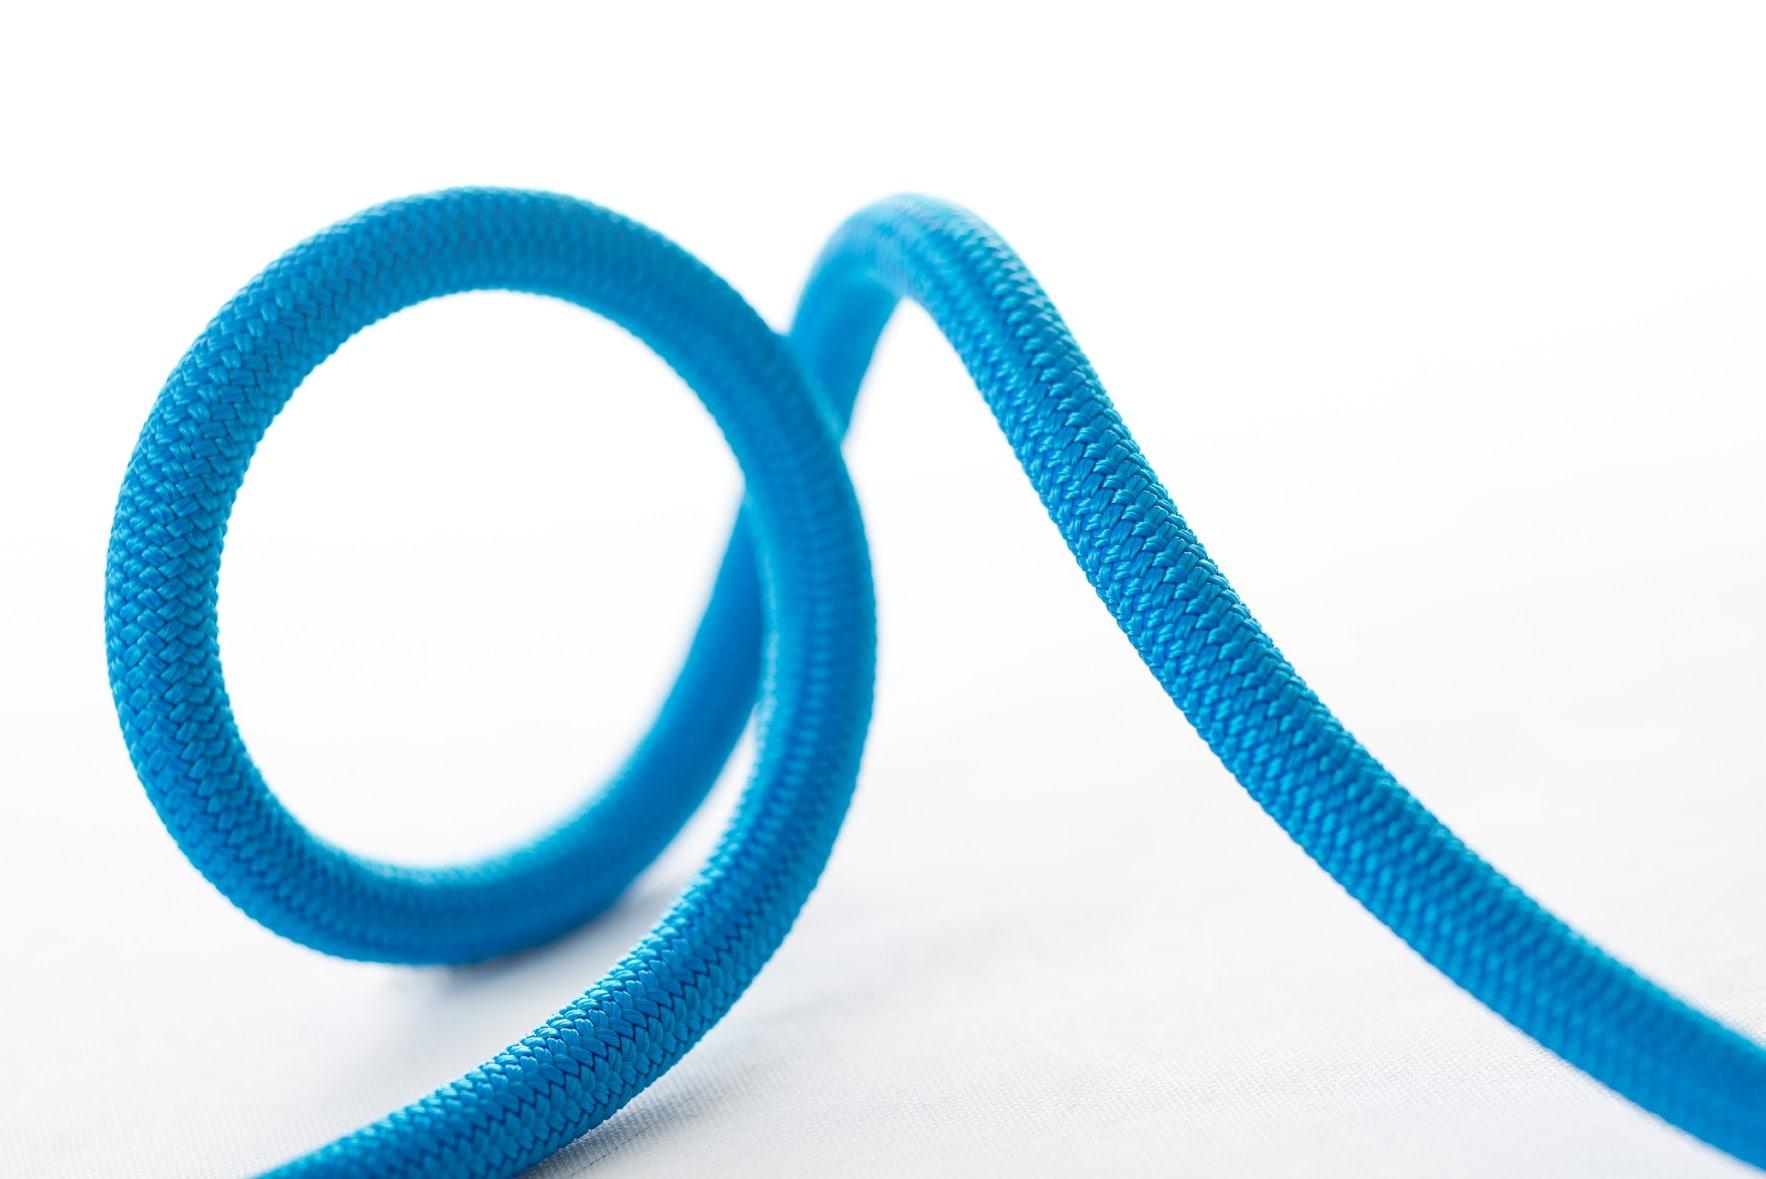 Beal OPERA 8.5mm blå tau